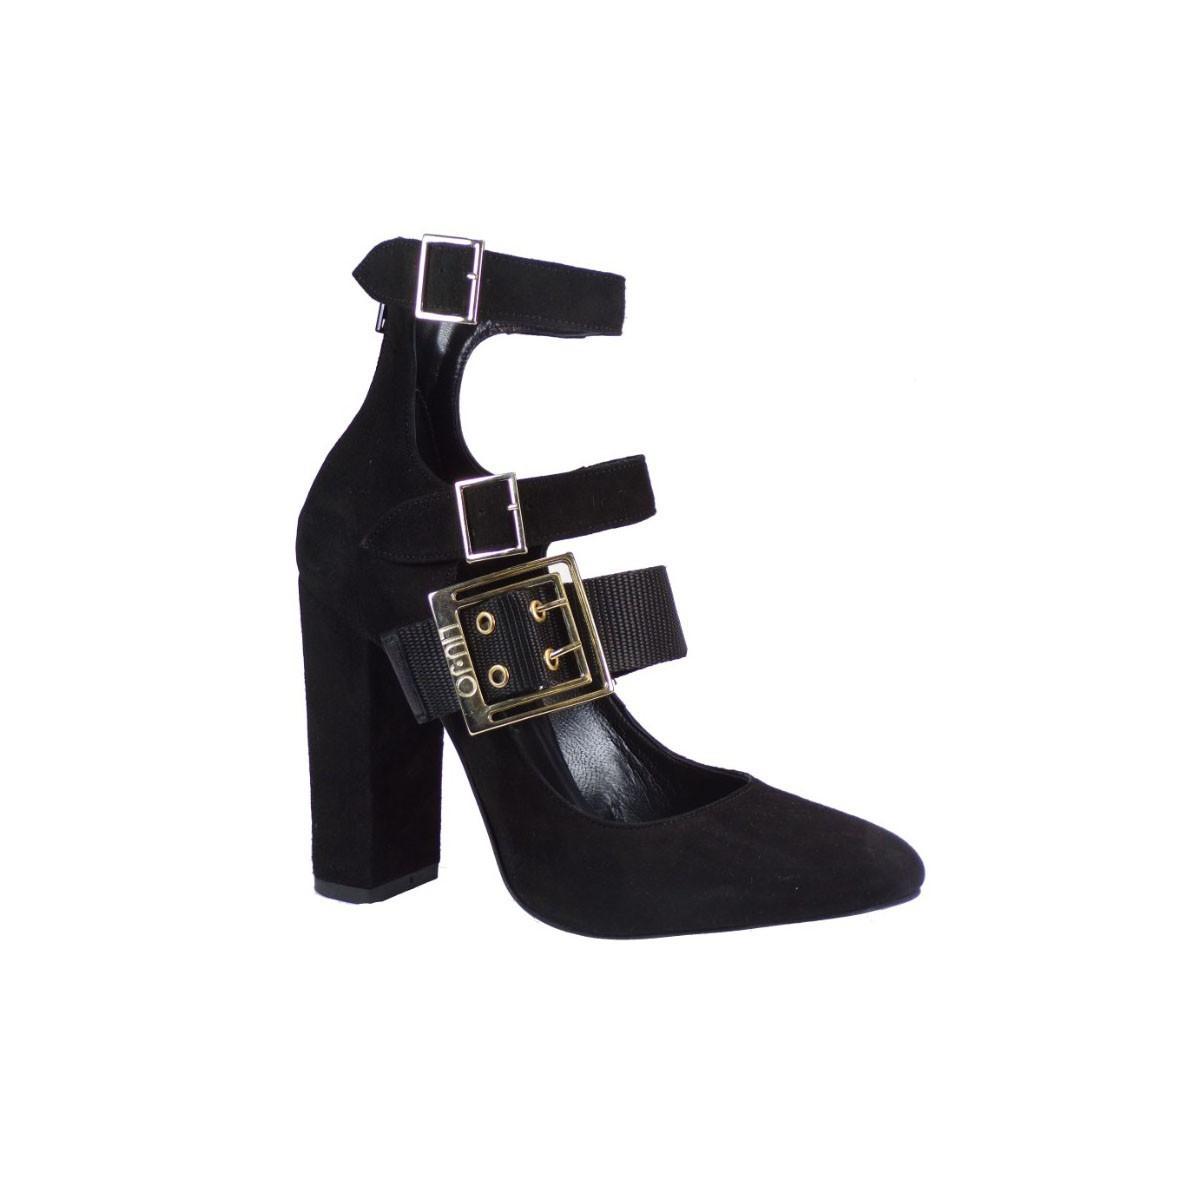 LIU JO DECOLLETE DONNA Γυναικεία Παπούτσια S67091 Μαύρο  11146c72482